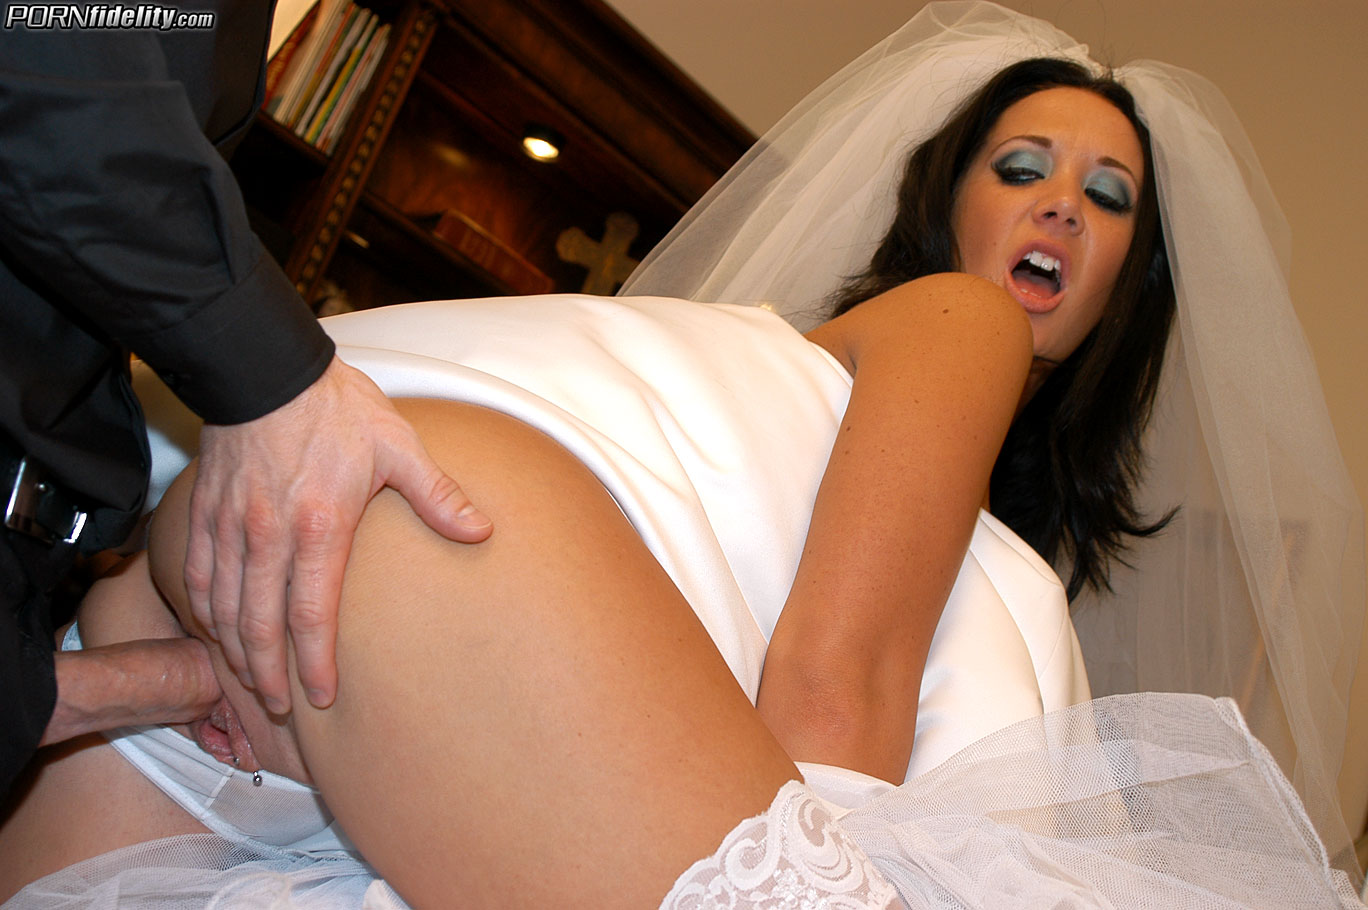 секс невесту в киску фото плечи куртенку какую-то